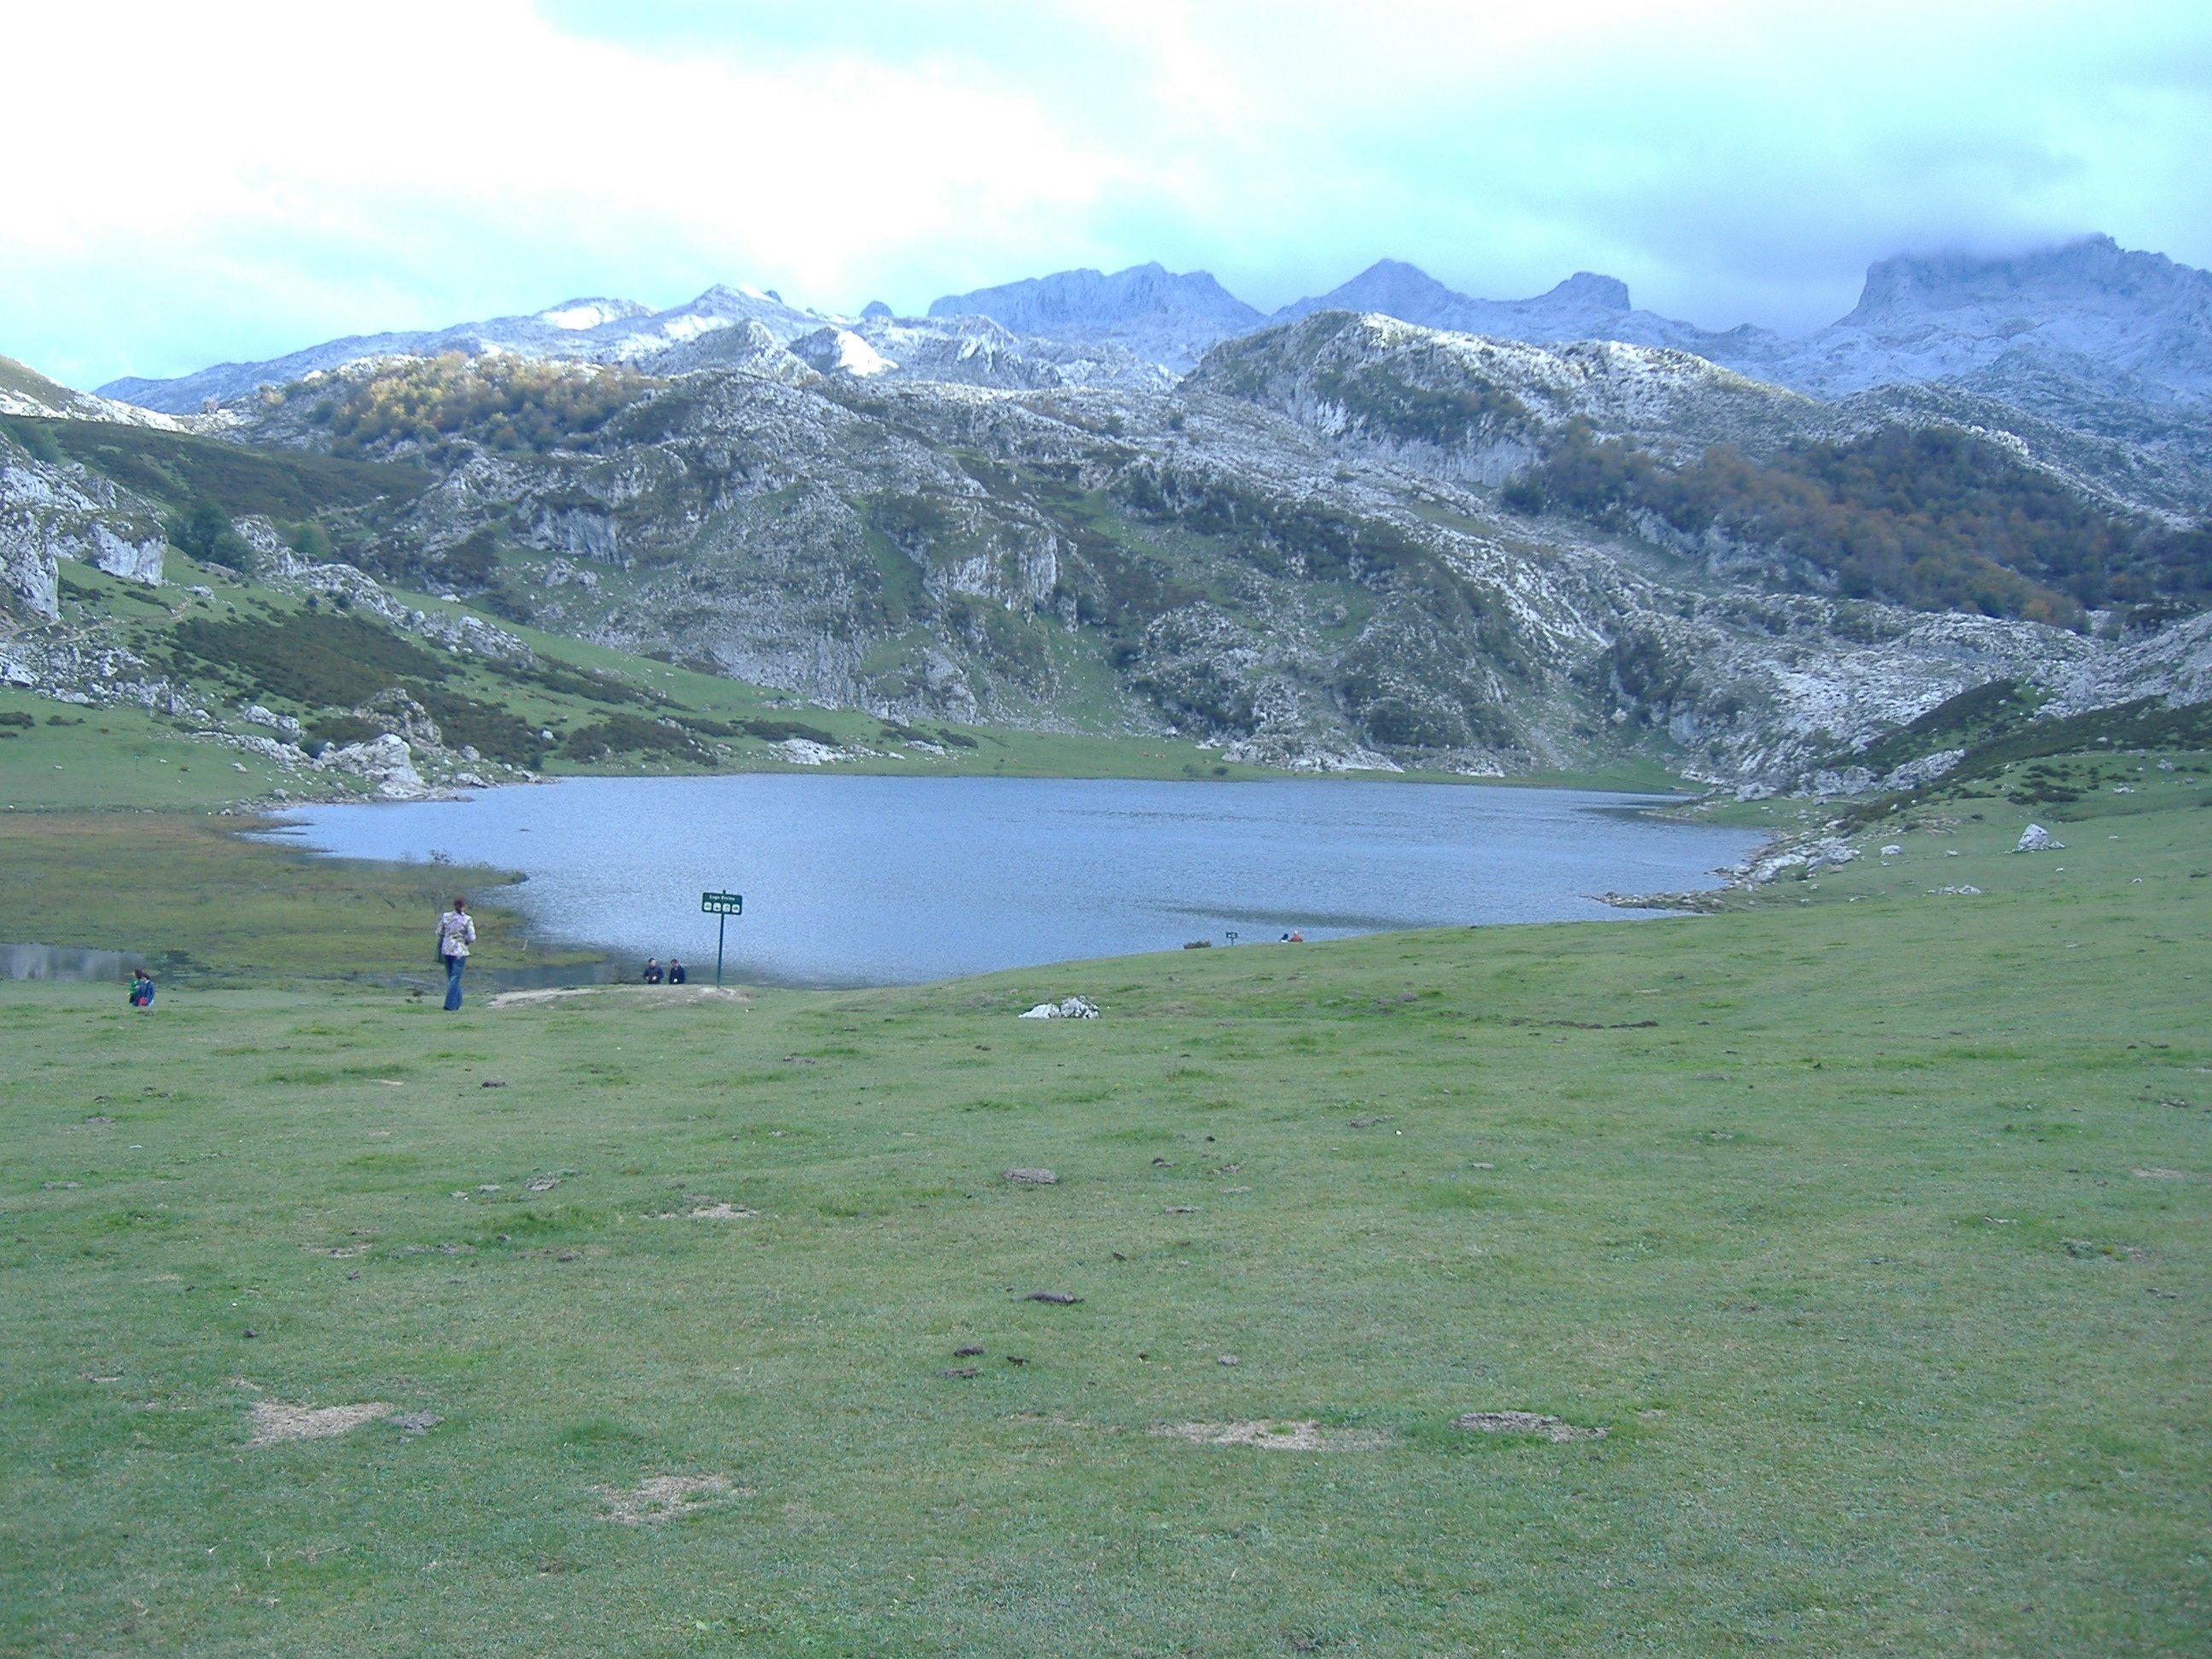 46 Lago de La Ercina. Cangas de Obnis (Asturias). Foto R. Suárez